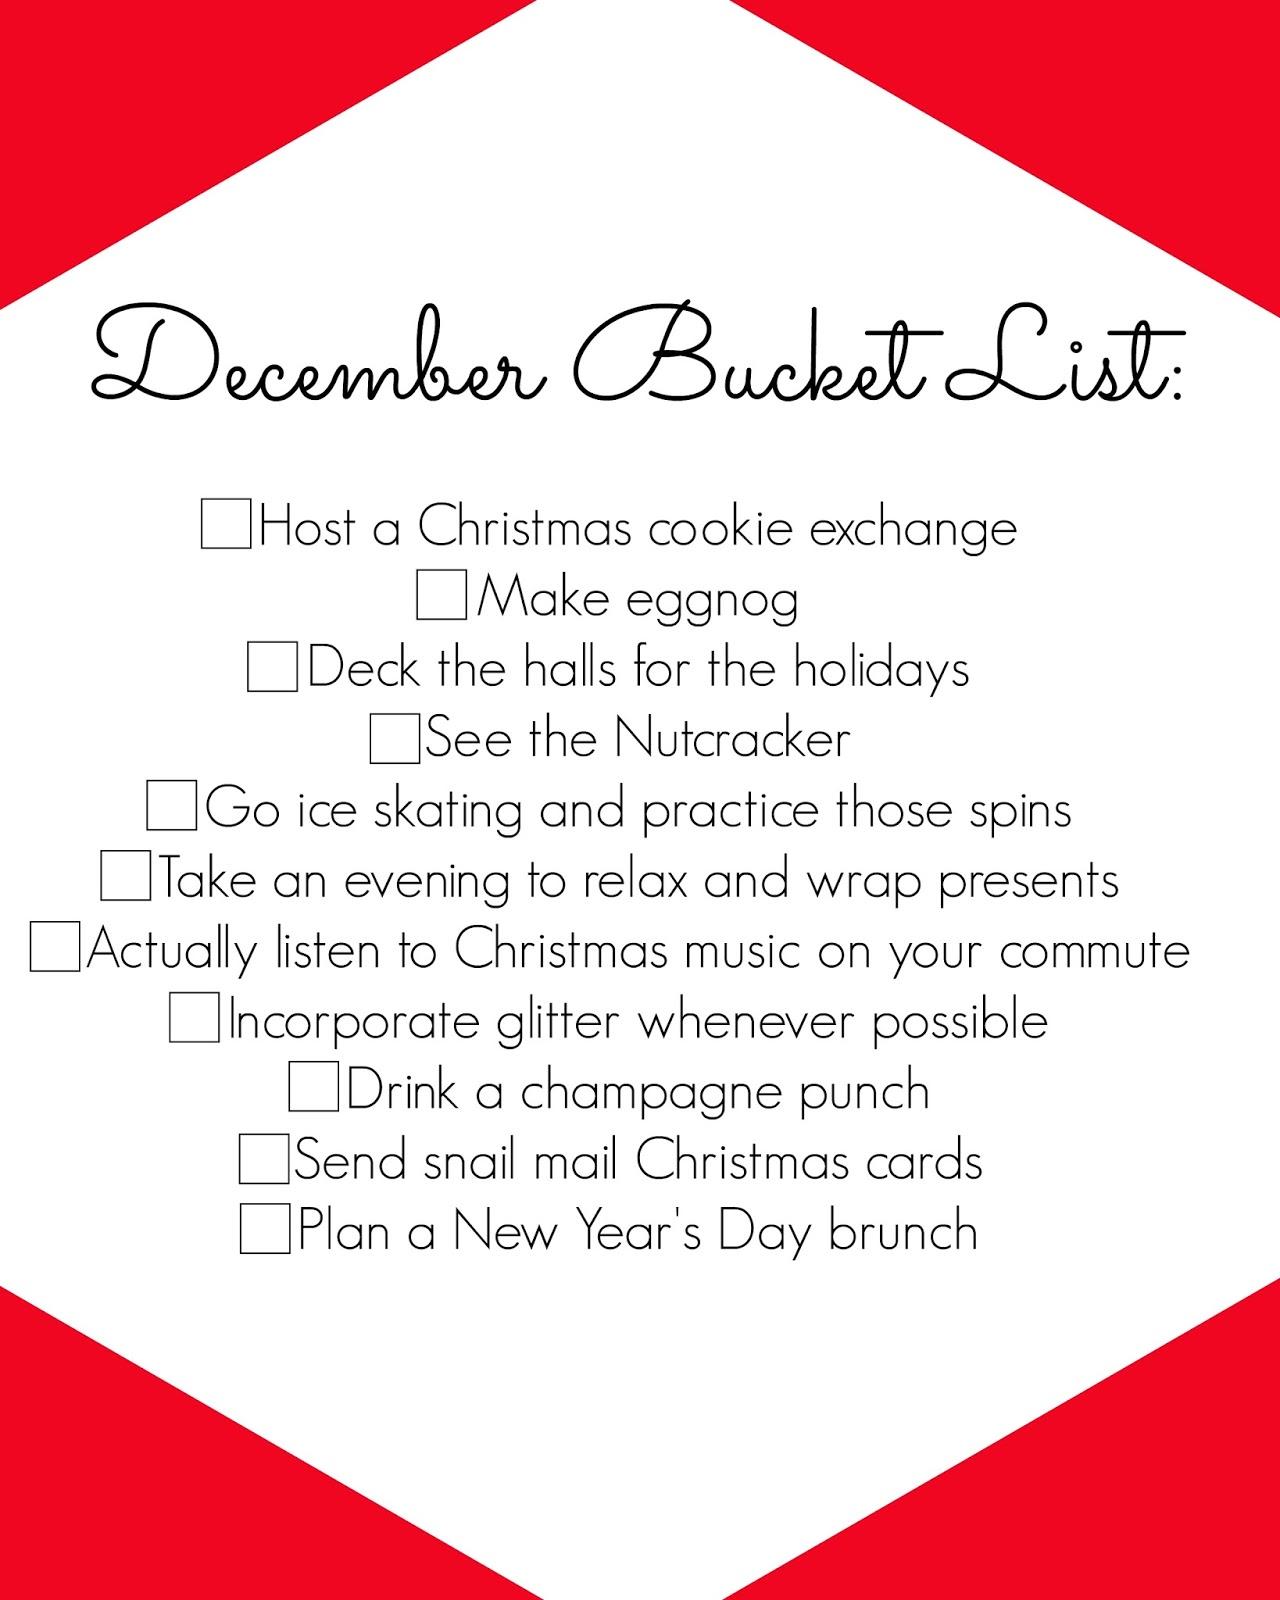 december bucket list - christmas bucket list - holiday bucket list - winter bucket list